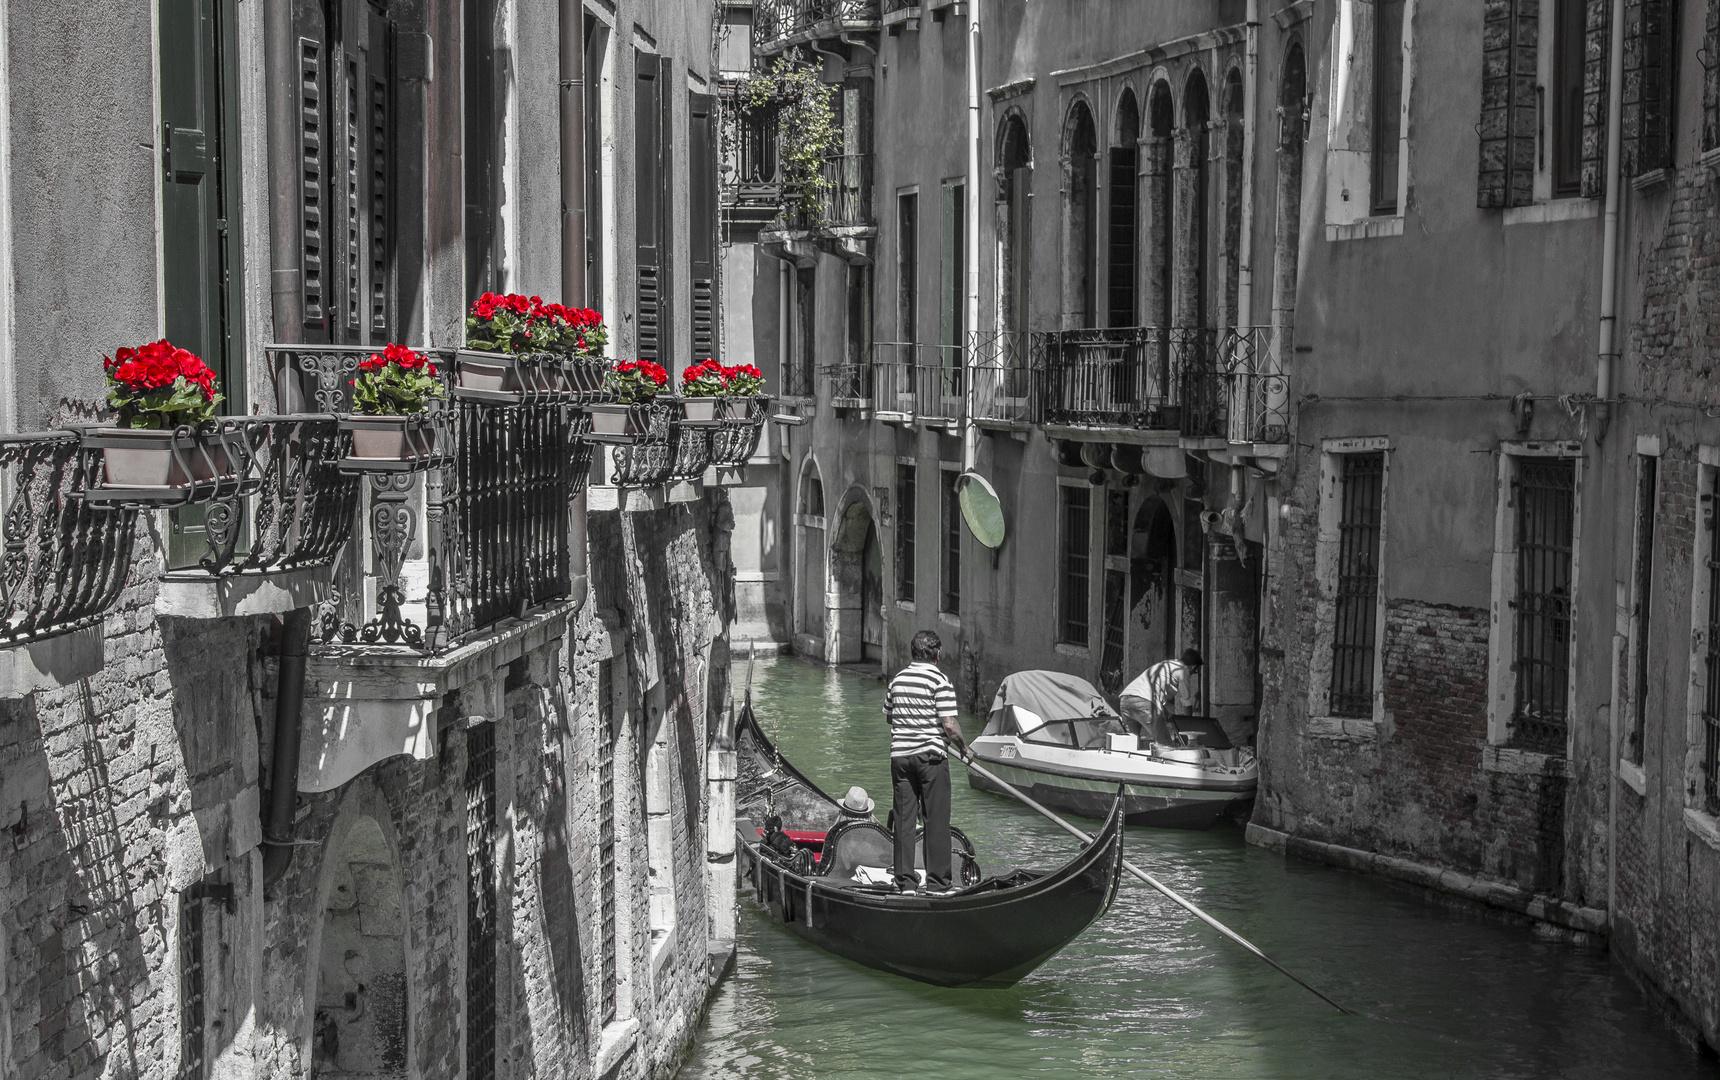 Venedig - Gondoliere